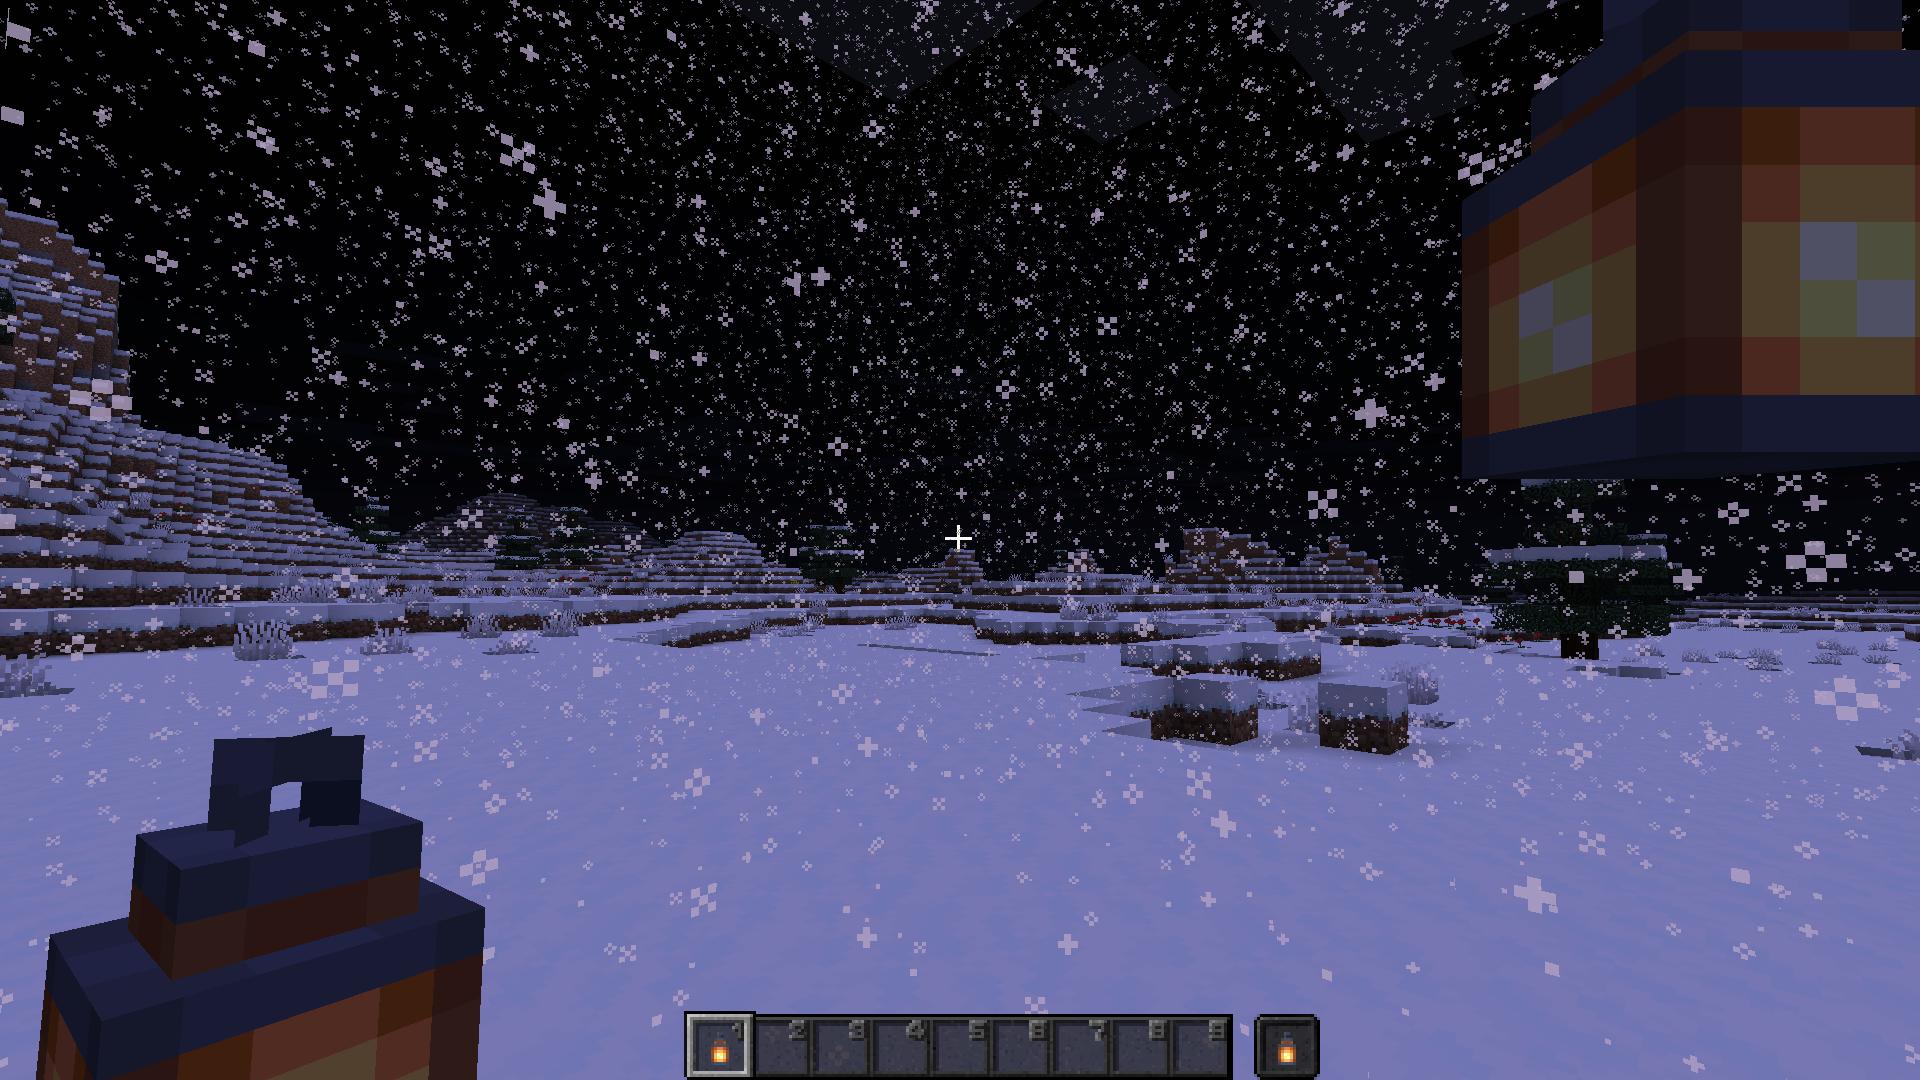 NBTpack - L'effet de neige